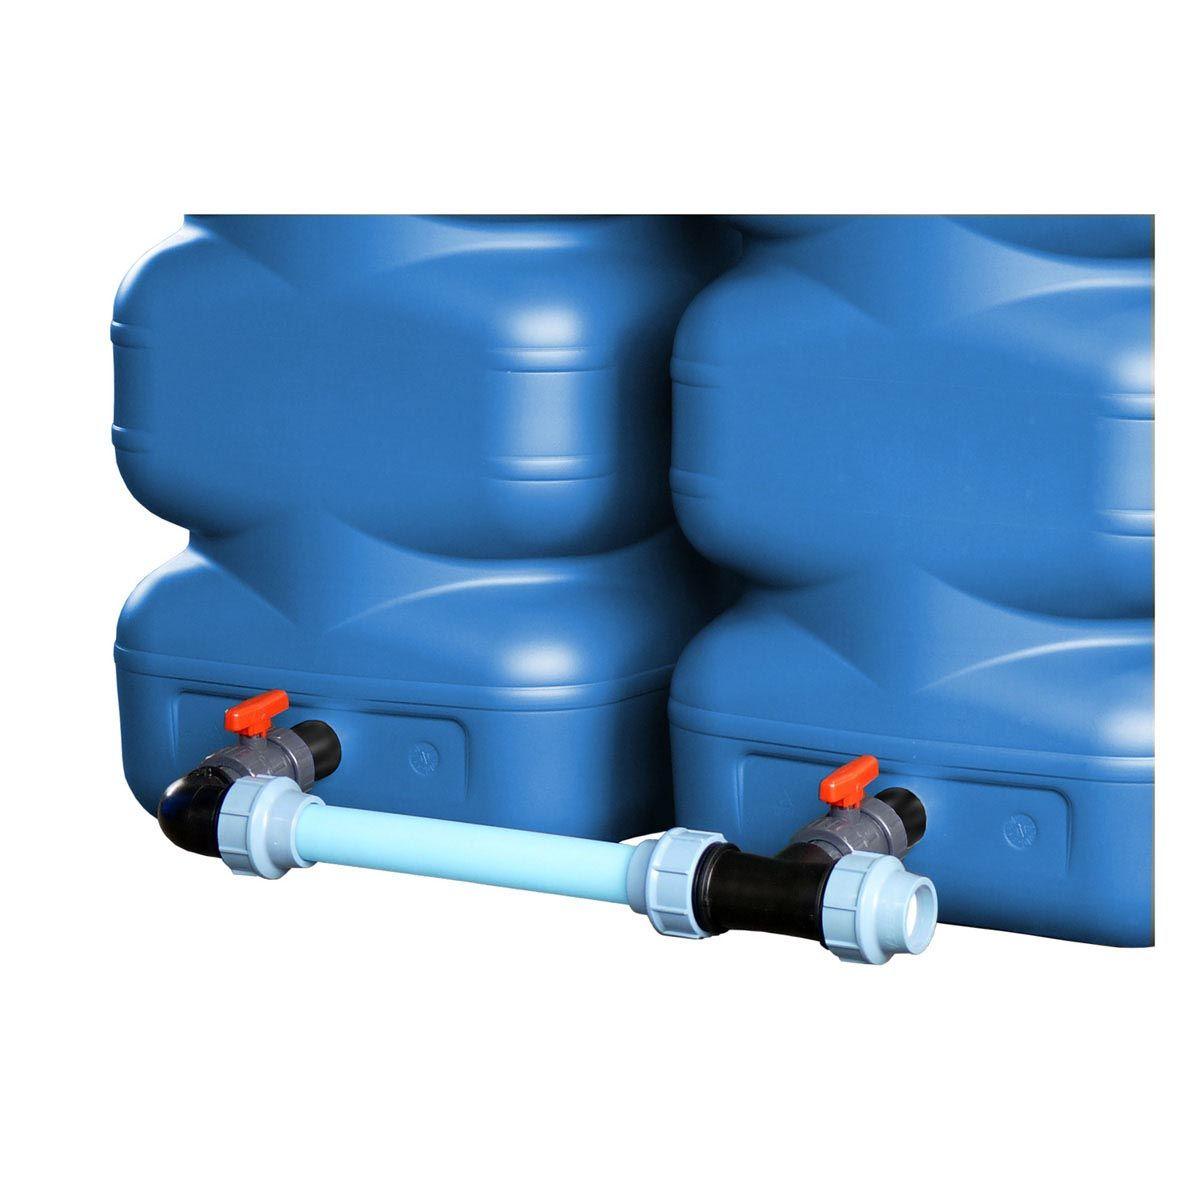 Verbindungs-Set DN 50, inkl. PVC Hahn, PE Rohr, PP Fitting, 1 1/2', DN 50